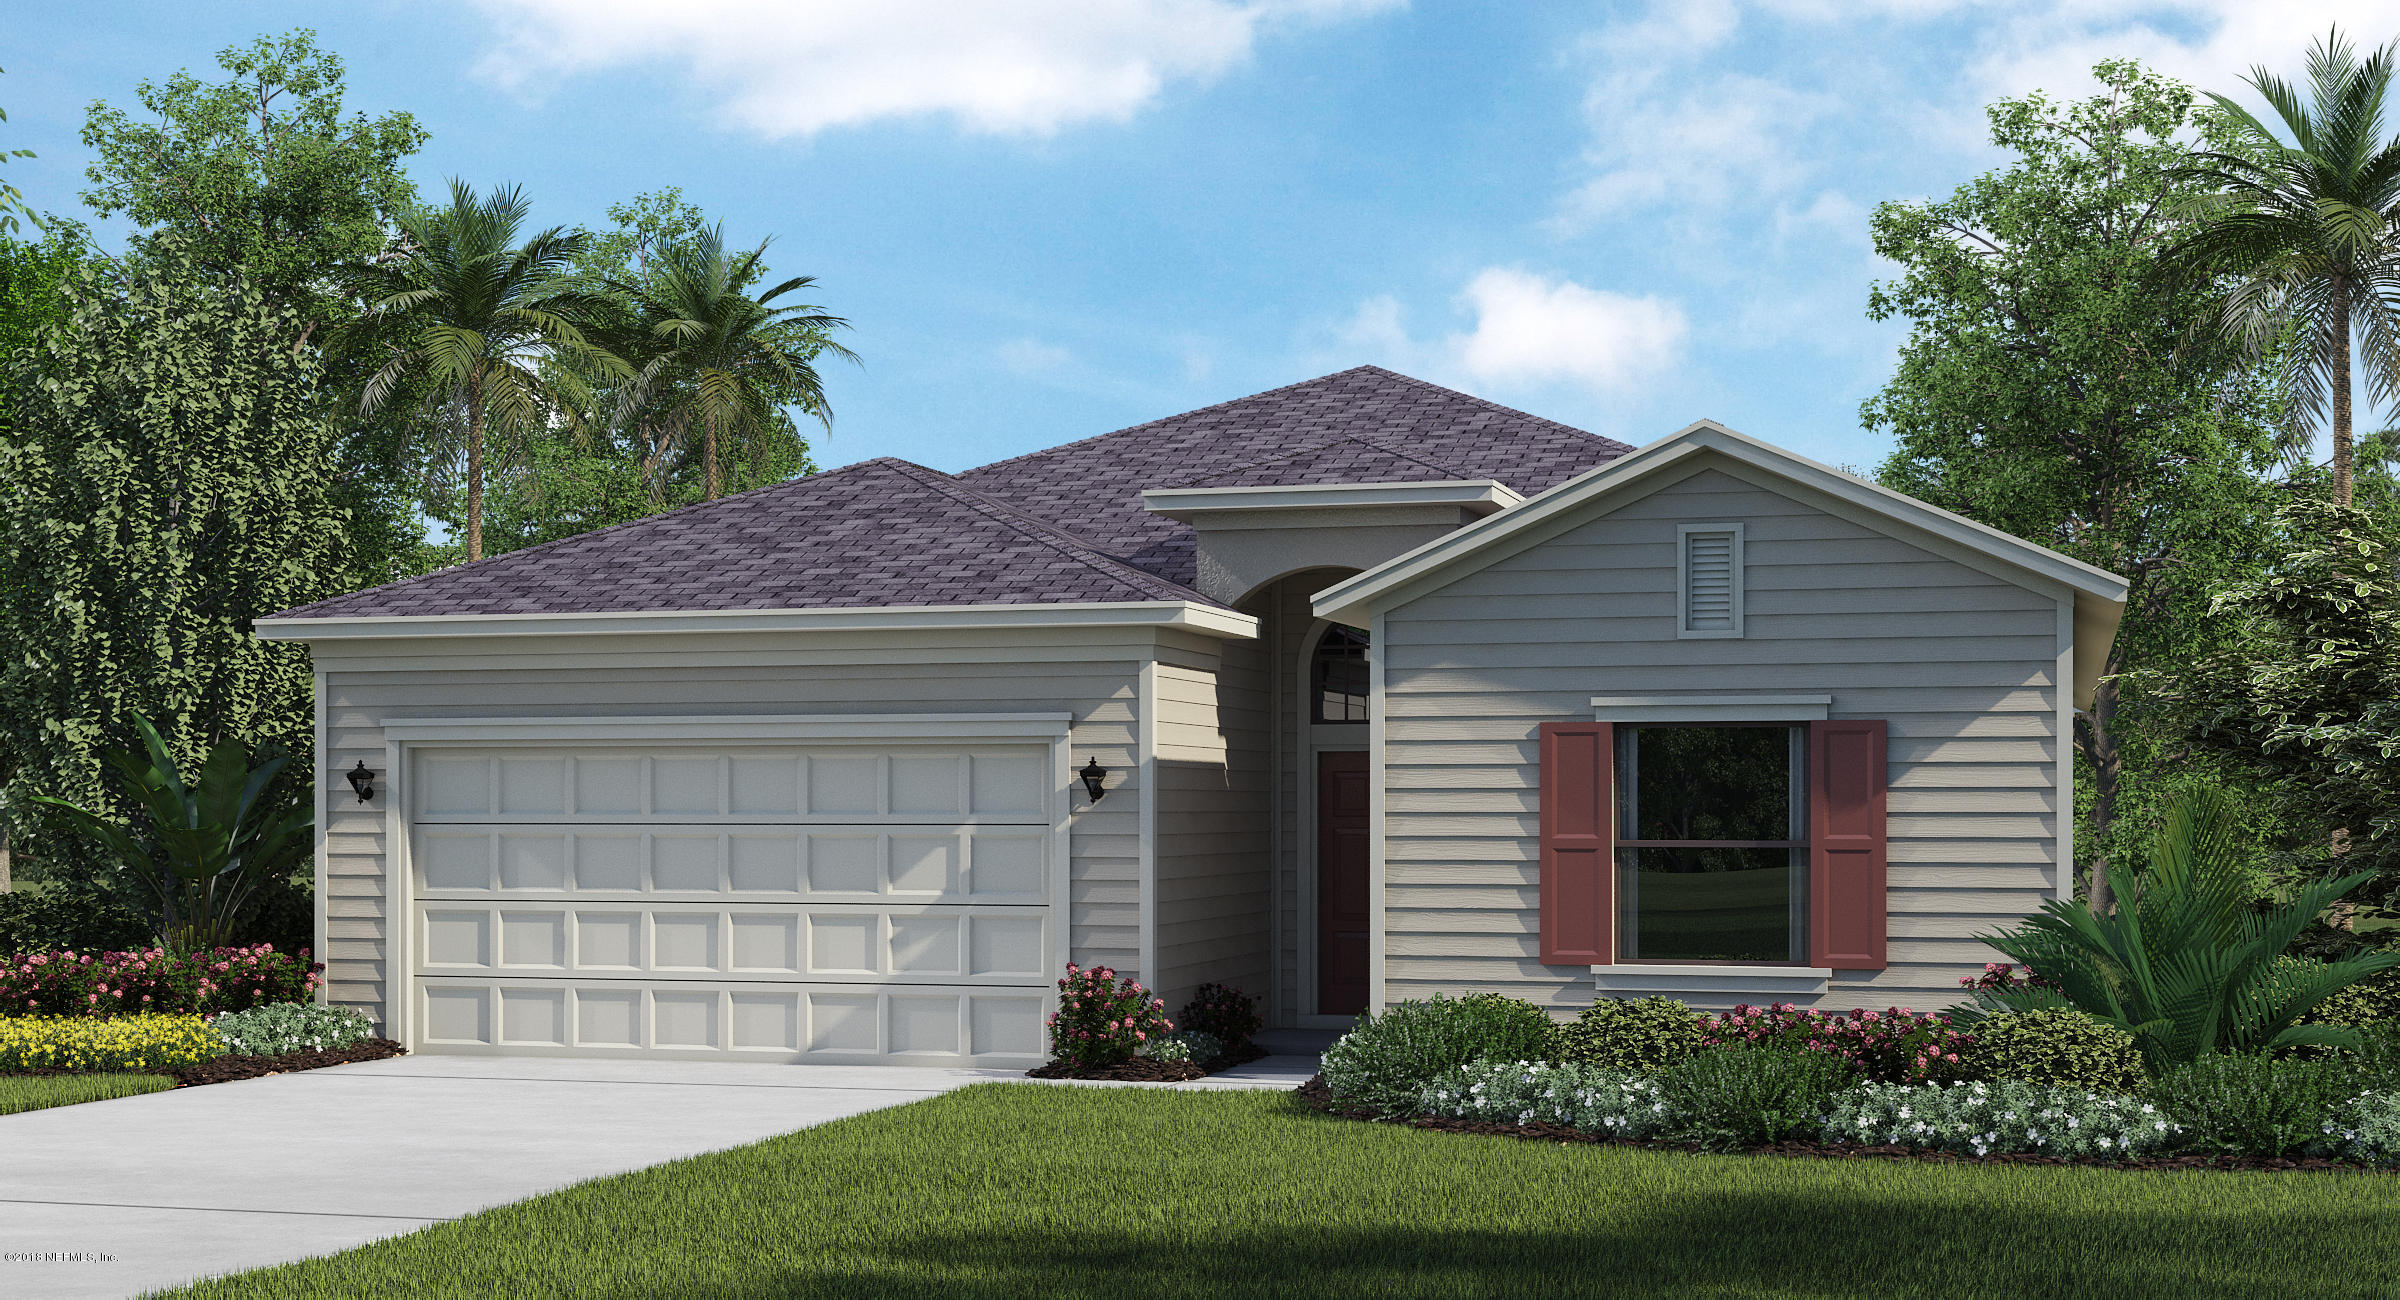 5361 PRESTON BENTLEY, JACKSONVILLE, FLORIDA 32218, 4 Bedrooms Bedrooms, ,3 BathroomsBathrooms,Residential - single family,For sale,PRESTON BENTLEY,948097